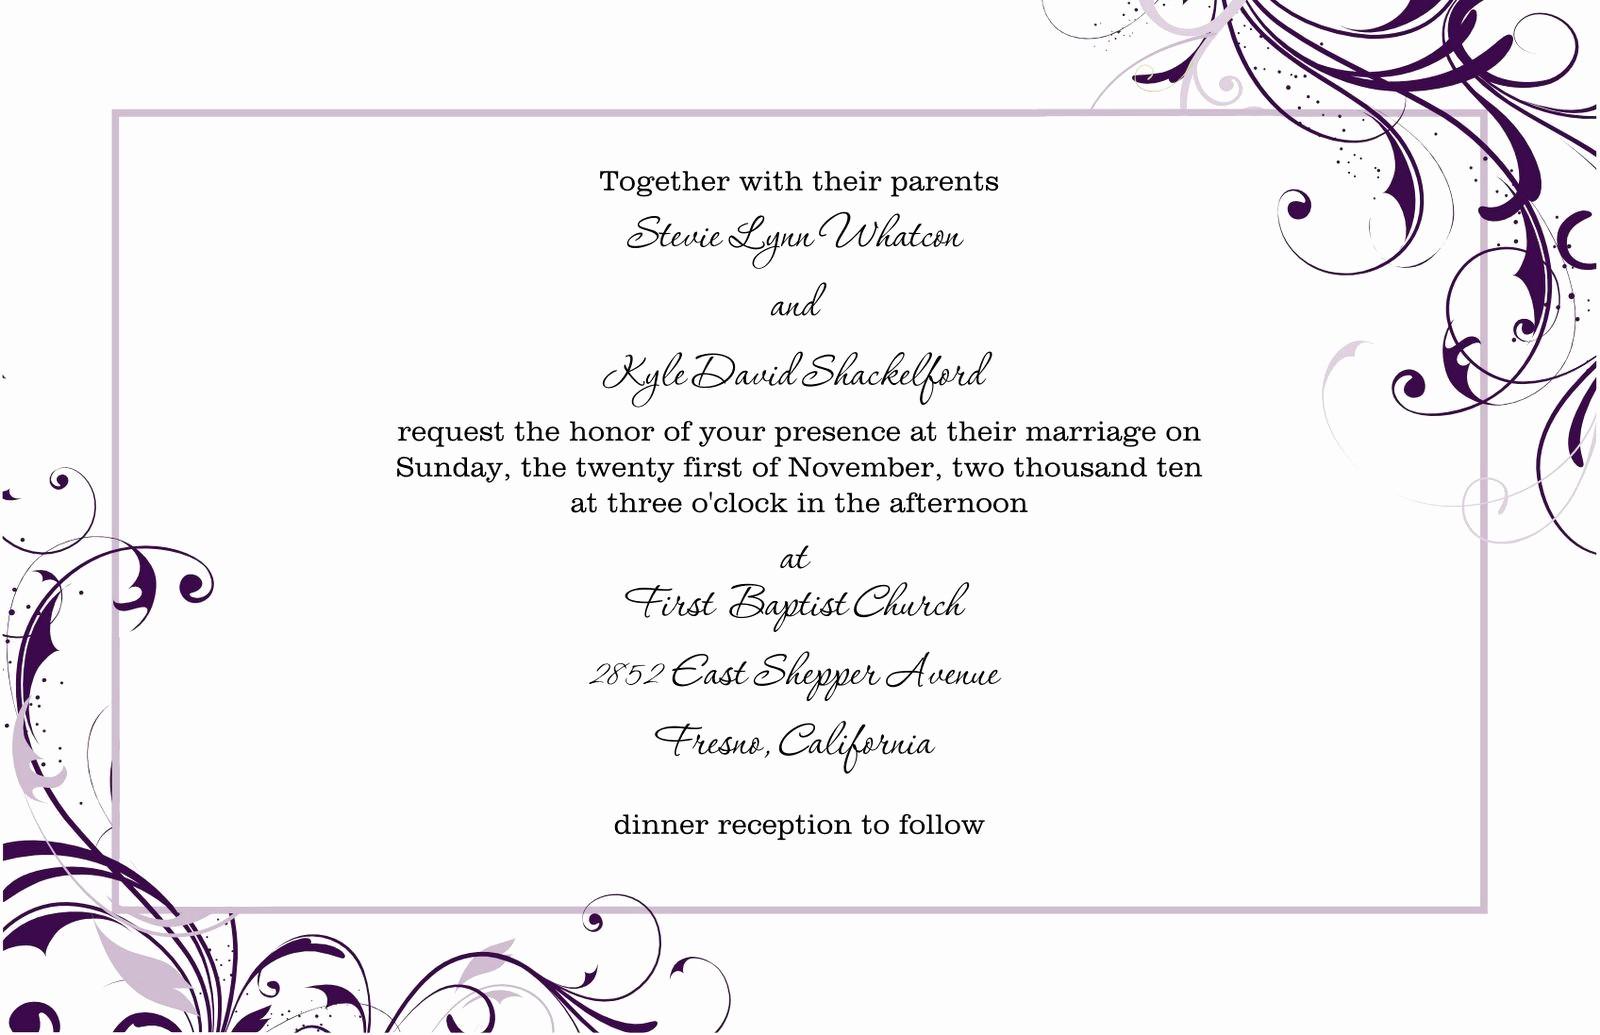 Wedding Invitations Templates Microsoft Word Elegant Free Blank Wedding Invitation Templates for Microsoft Word